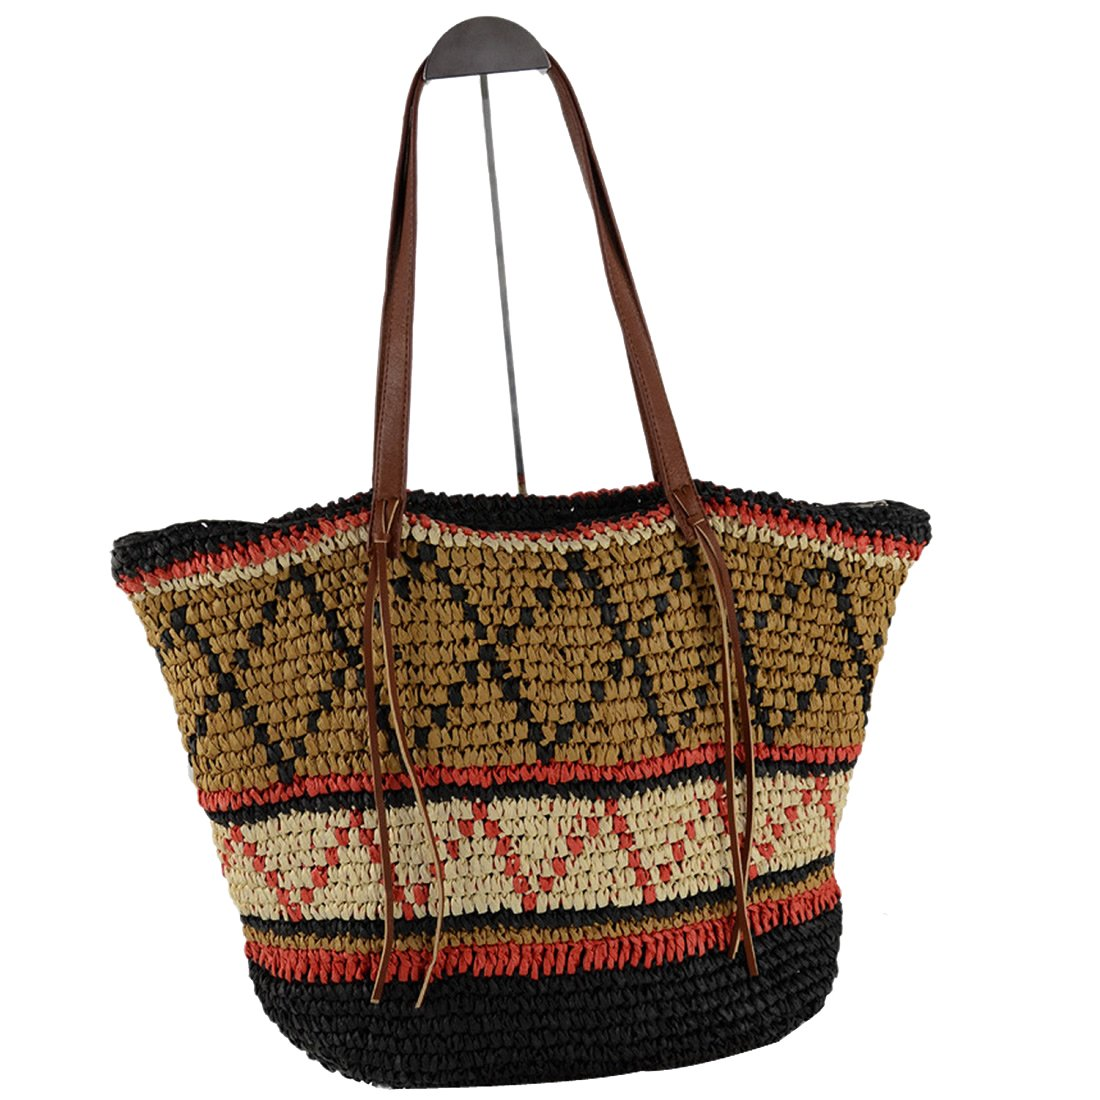 EROUGE Natural Chic Straw Bag Hand Woven Shoulder Bag Retro Summer Beach Bag Large Hobo Beach Bag